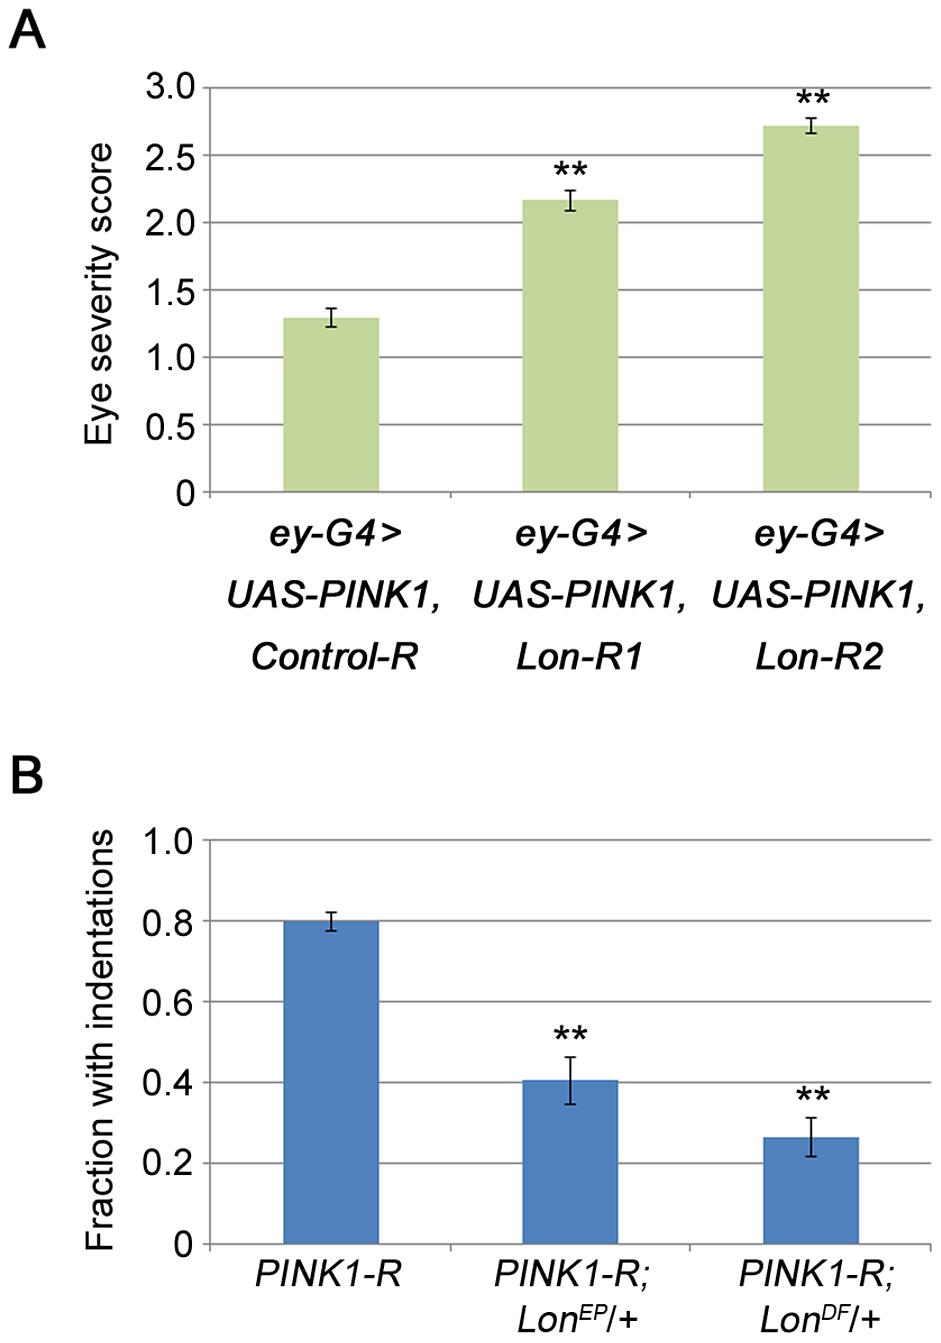 Lon deficiency stimulates PINK1 activity <i>in vivo</i>.